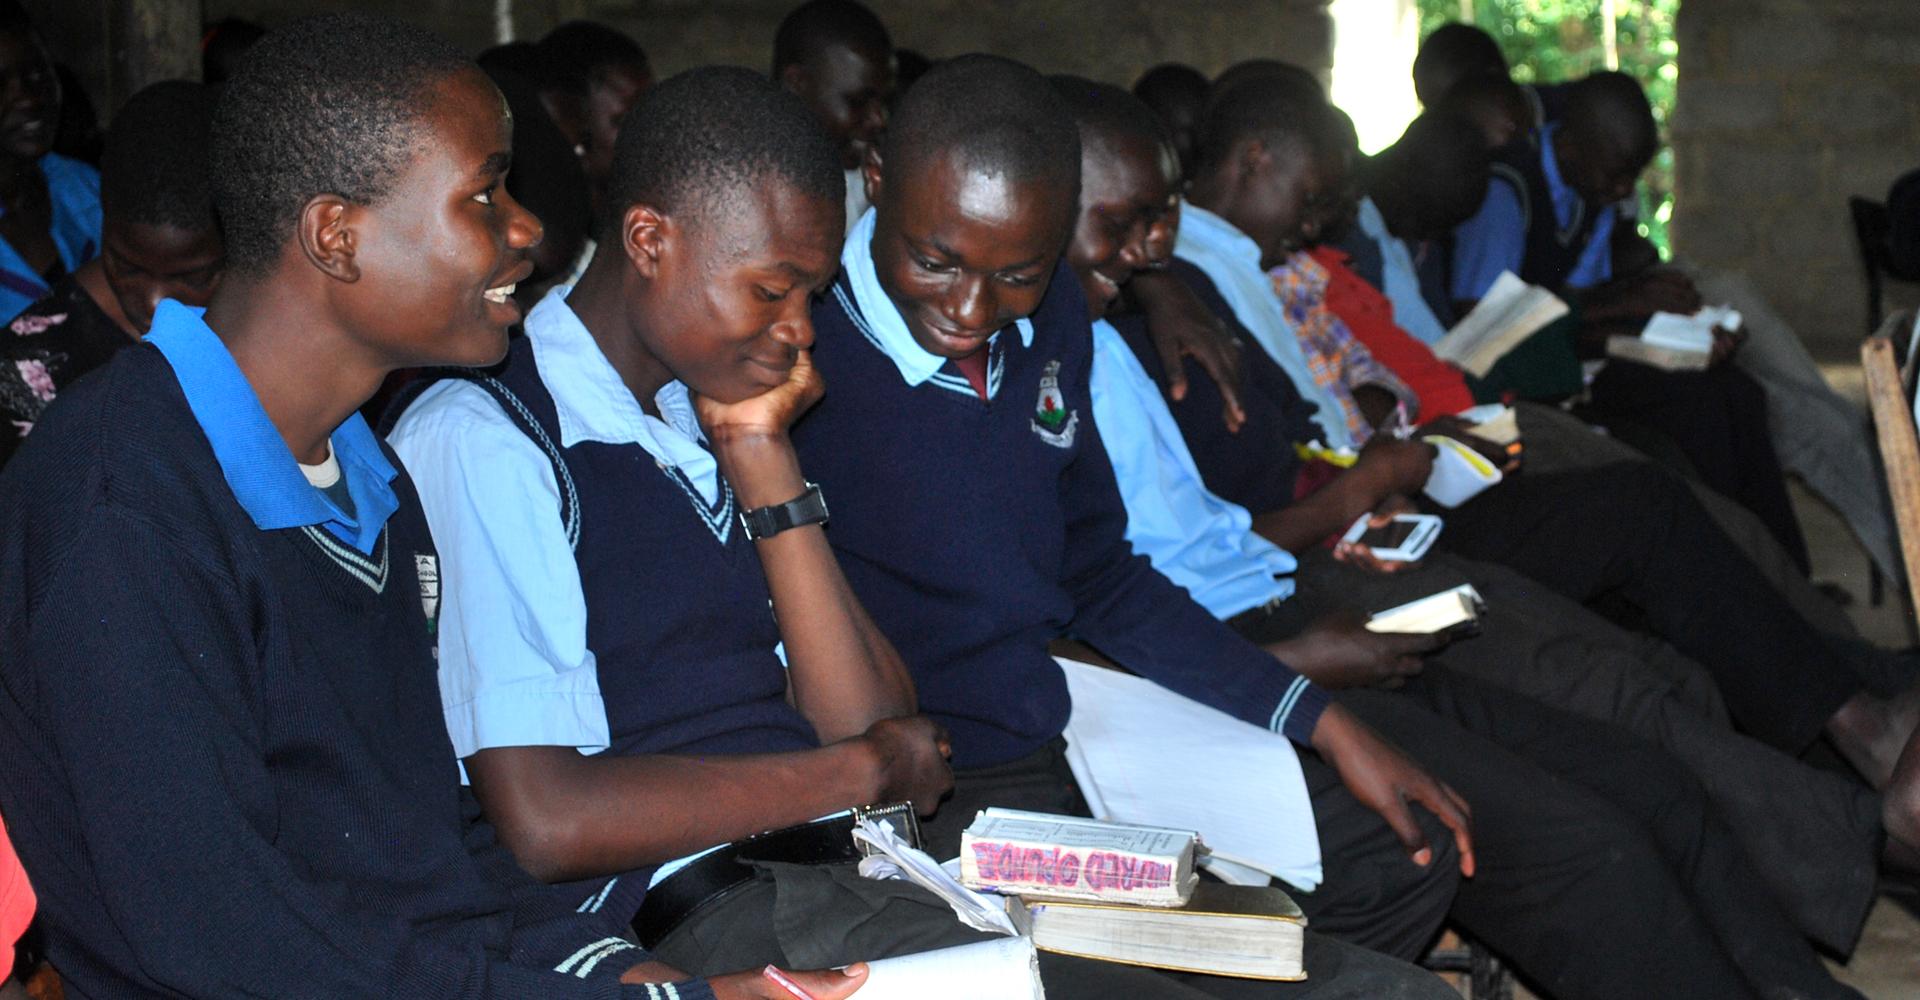 ANUALLY IN KENYA